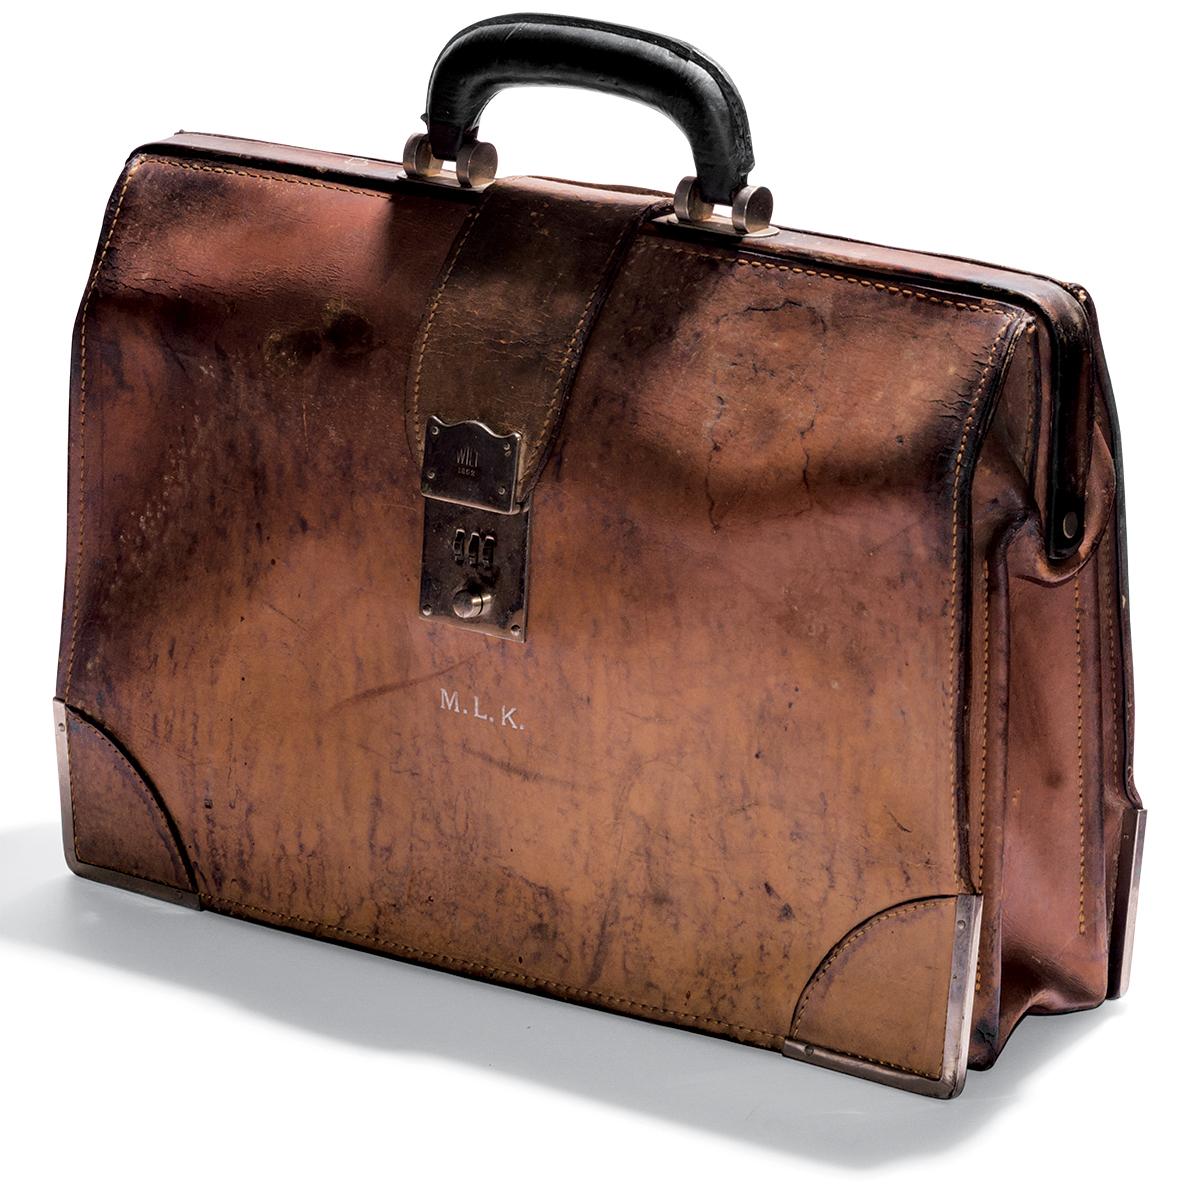 martin-luther-king-jr-briefcase-bu